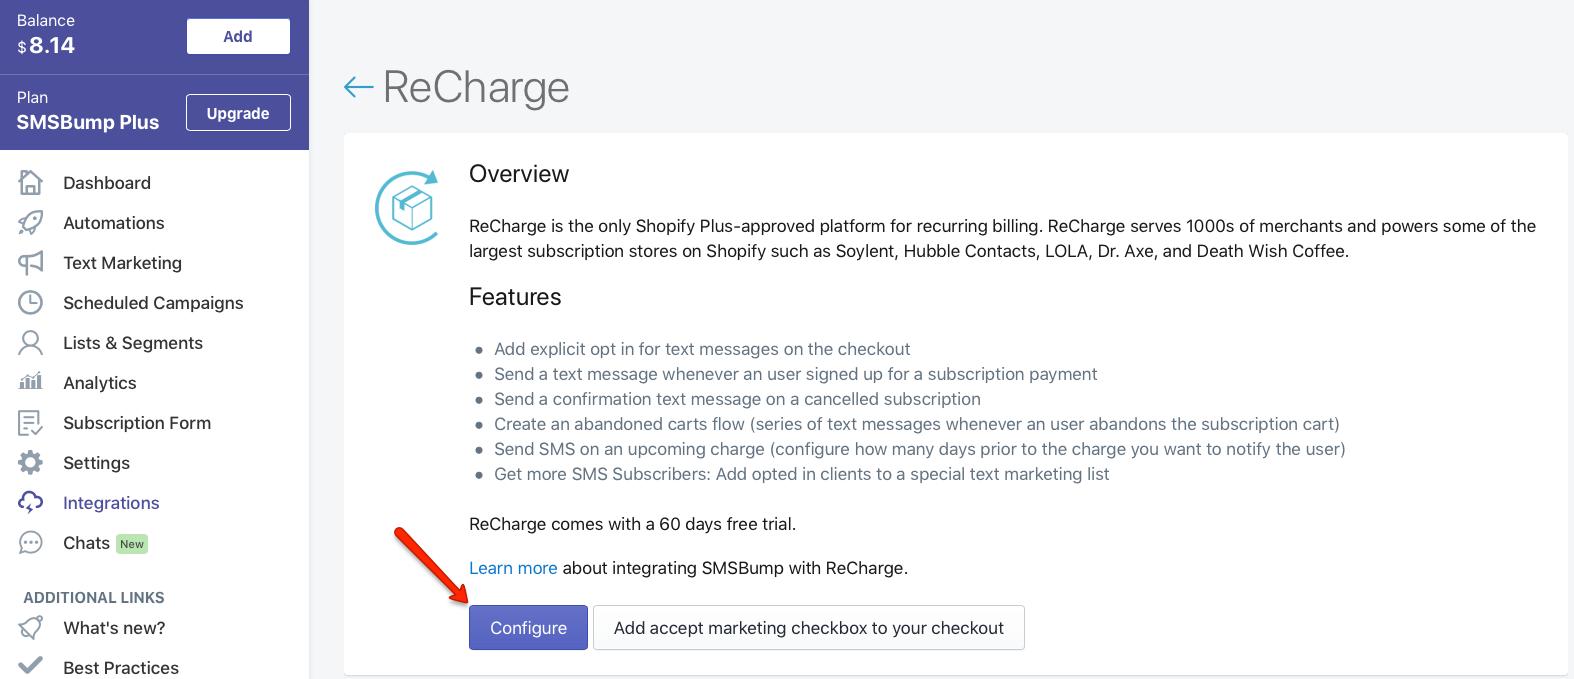 smsbump-recharge-configure-app